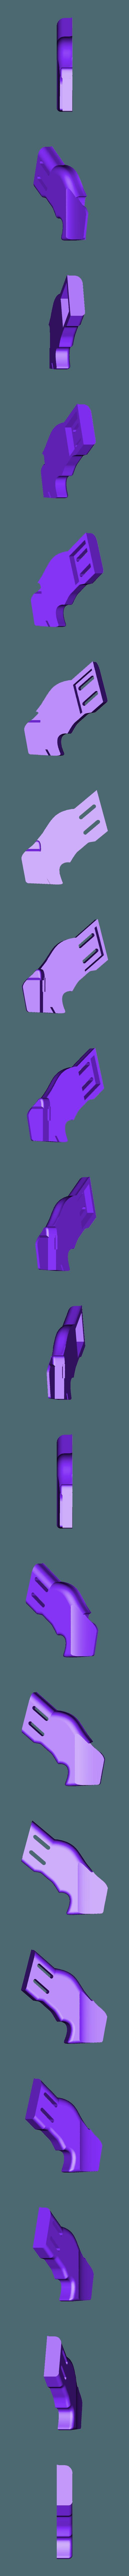 STL_S5_v20_Grip_1_.stl Download free STL file Star Wars Naboo S5 Heavy Blaster Pistol • 3D printing design, Dsk